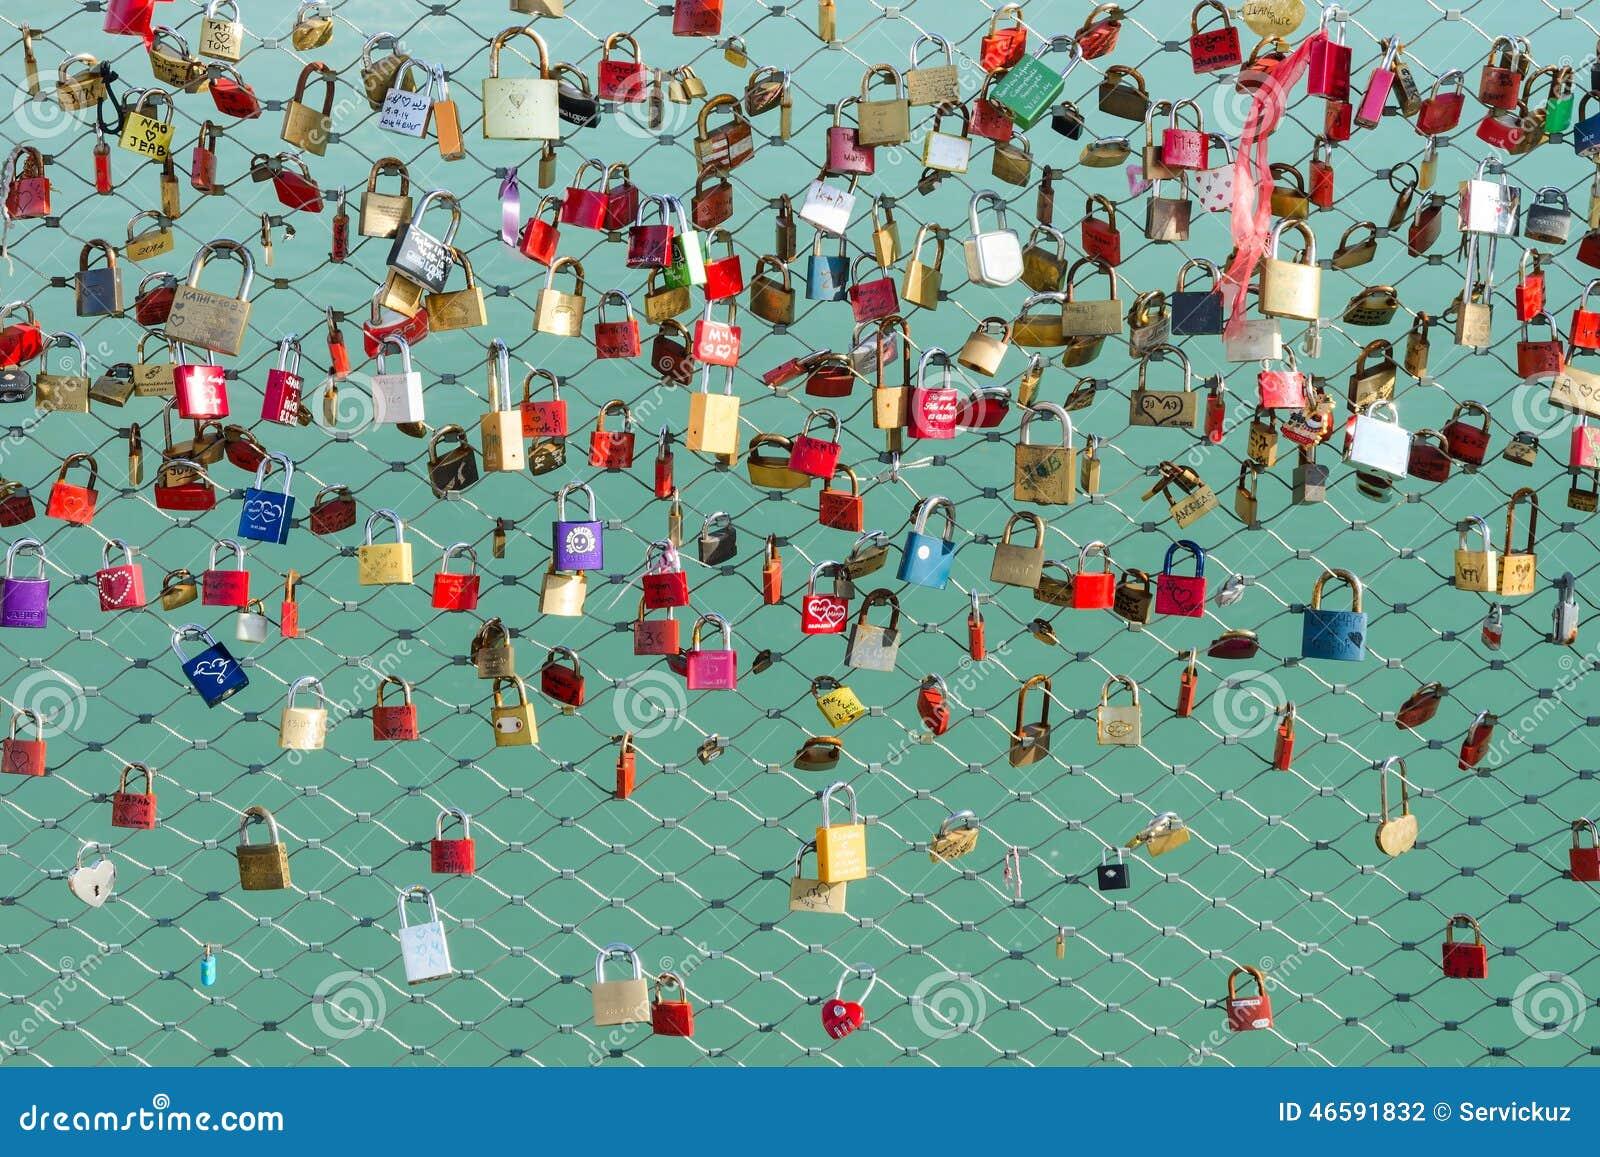 Locks On The Bridge Symbol Of Loyalty And Eternal Love Editorial